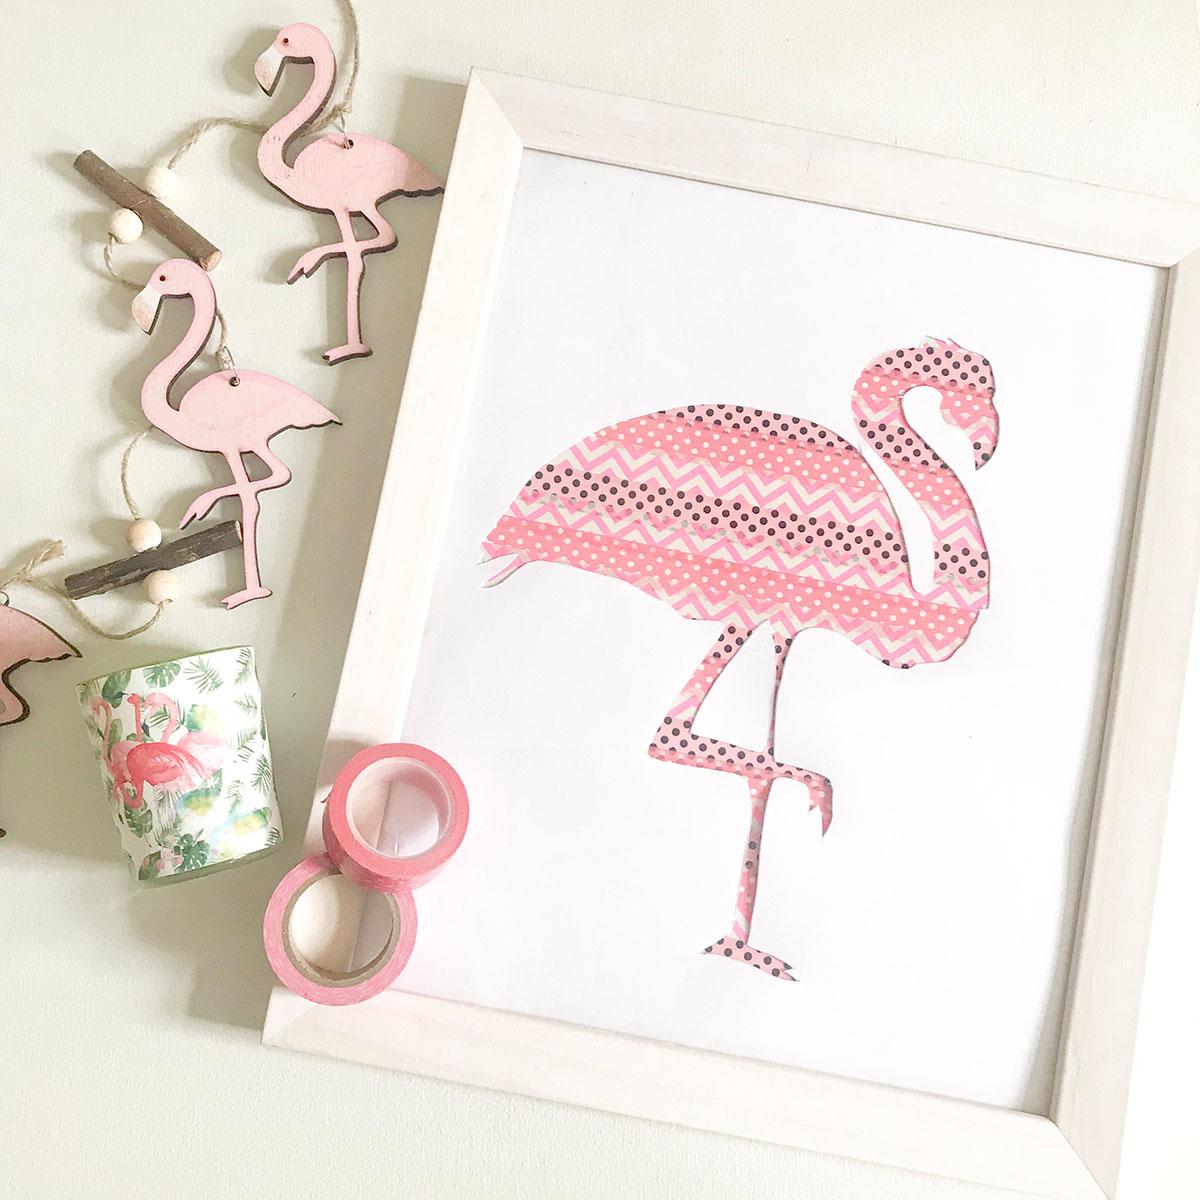 Flamingo DIY | Sommerdeko | Sommer DIY | DIY | Sommer | Flamingo | Bild selbermachen